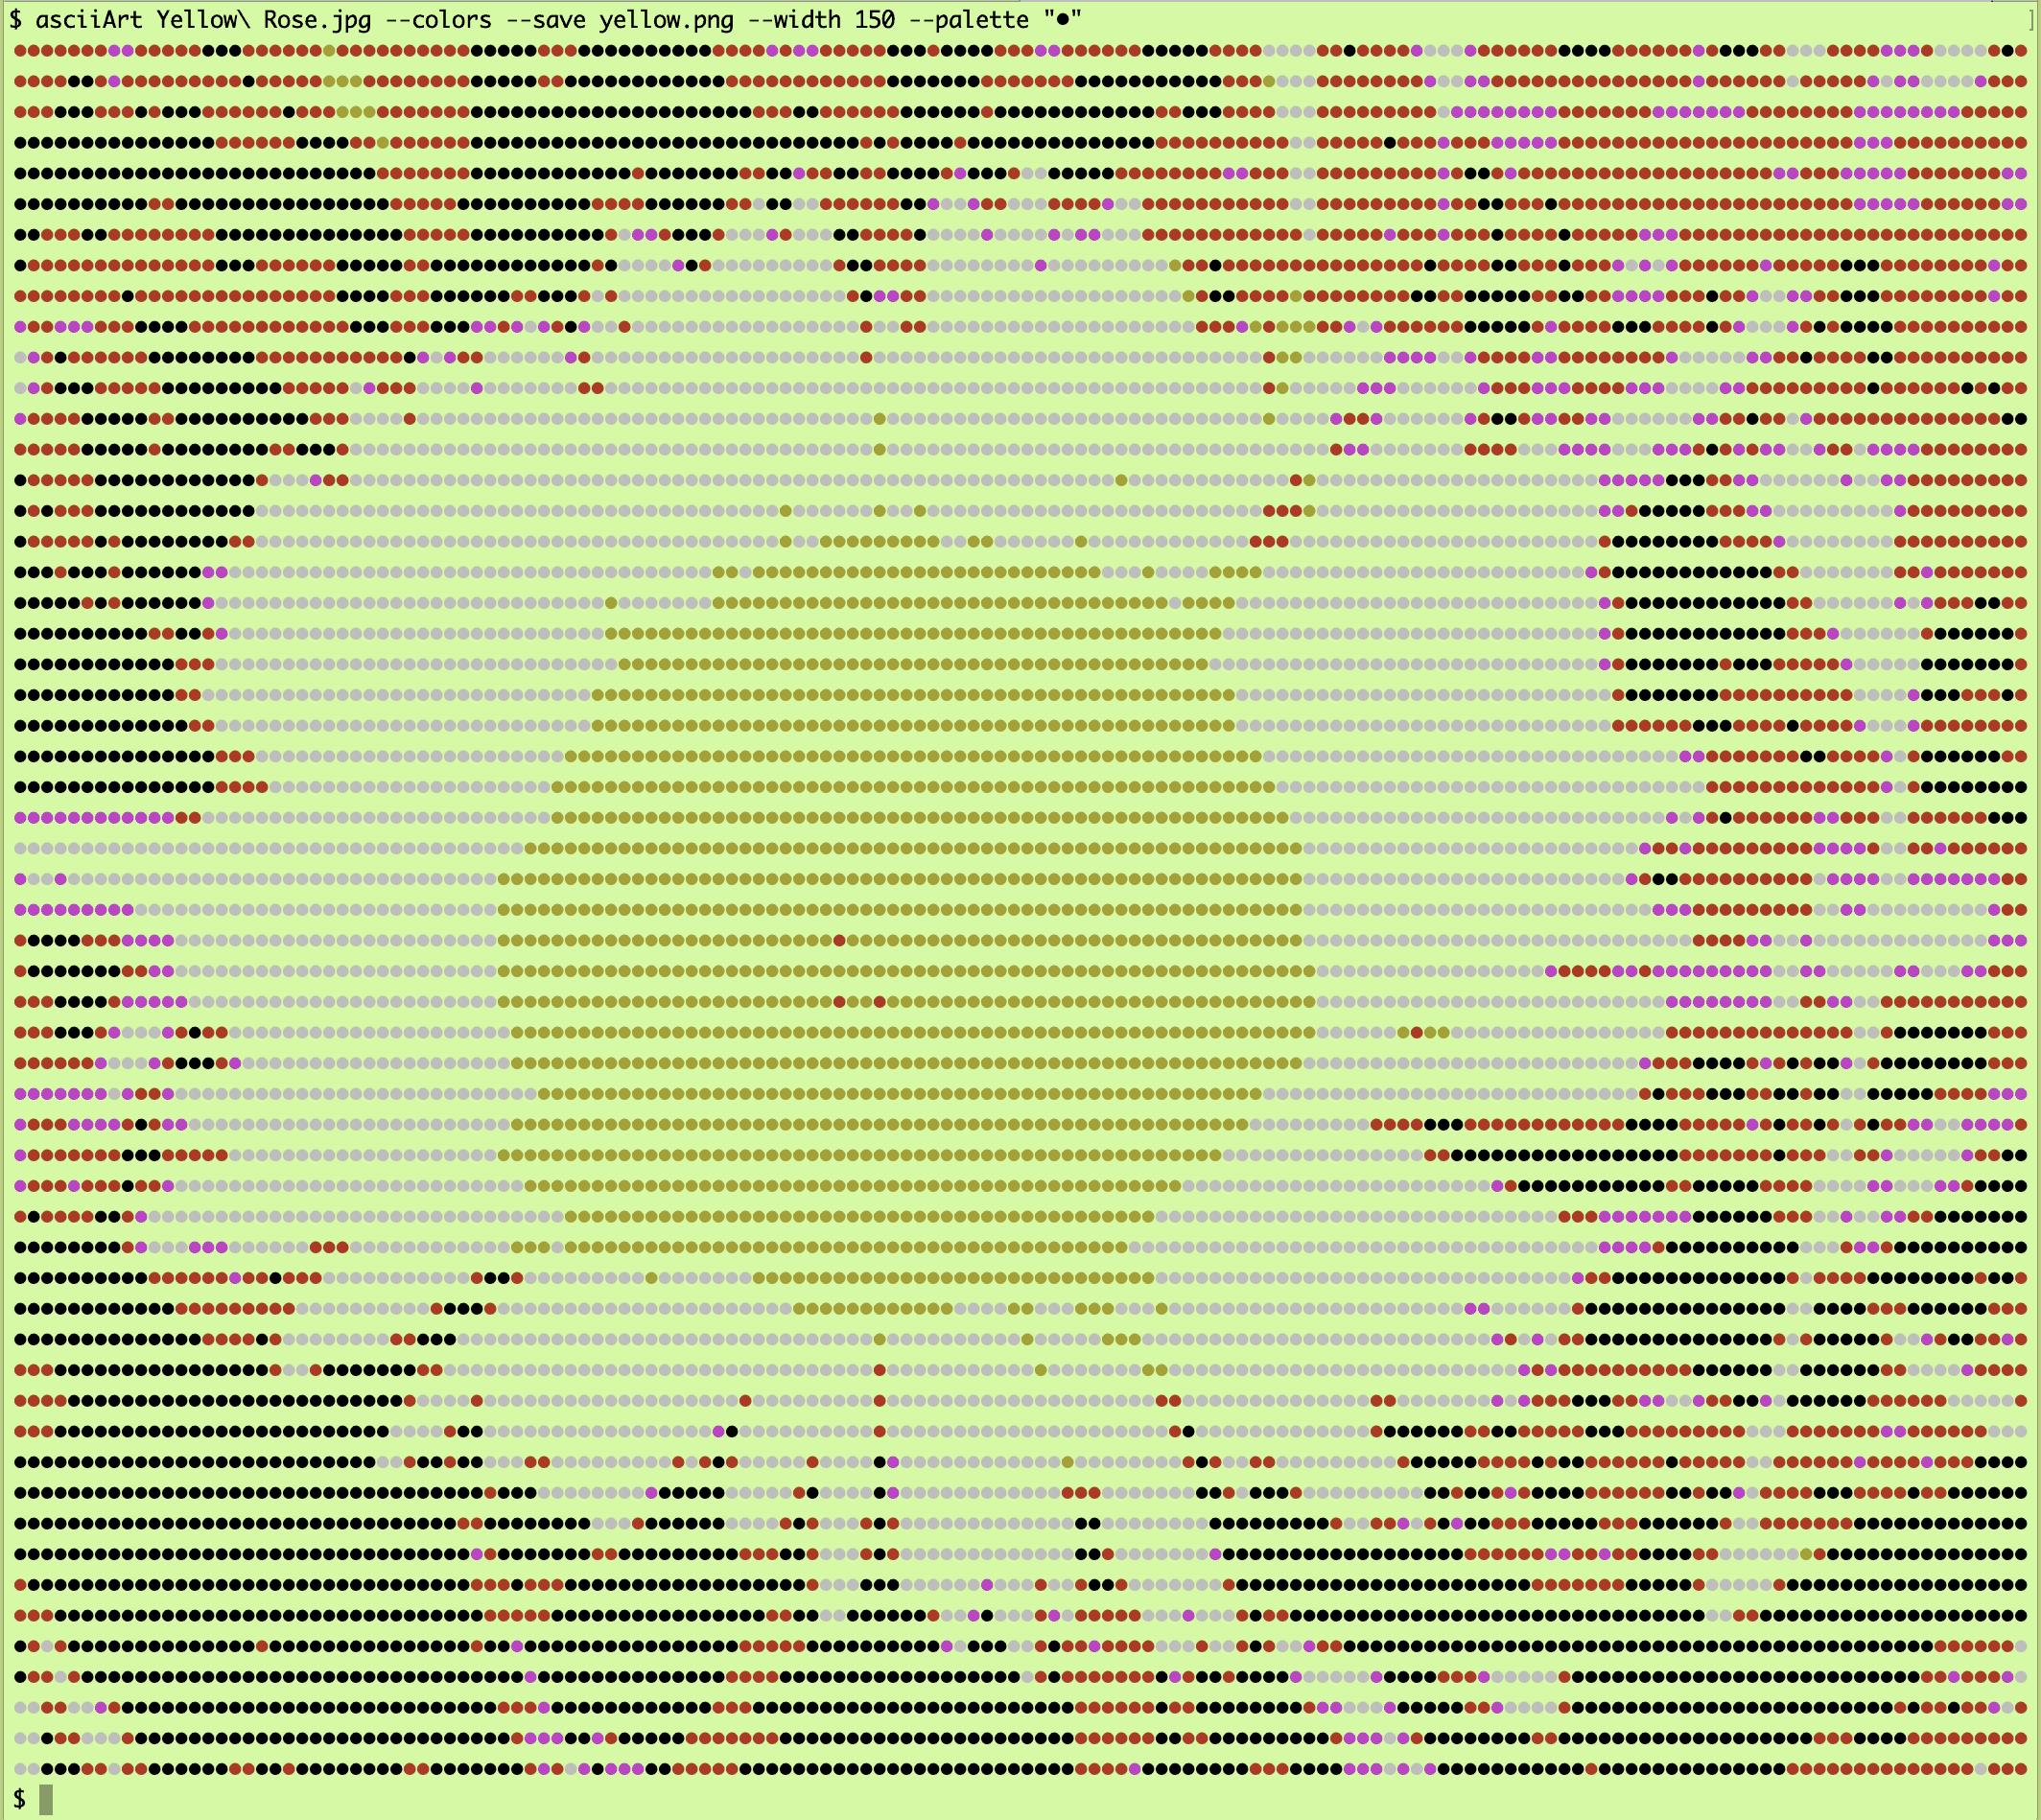 Yellow Rose ASCII art